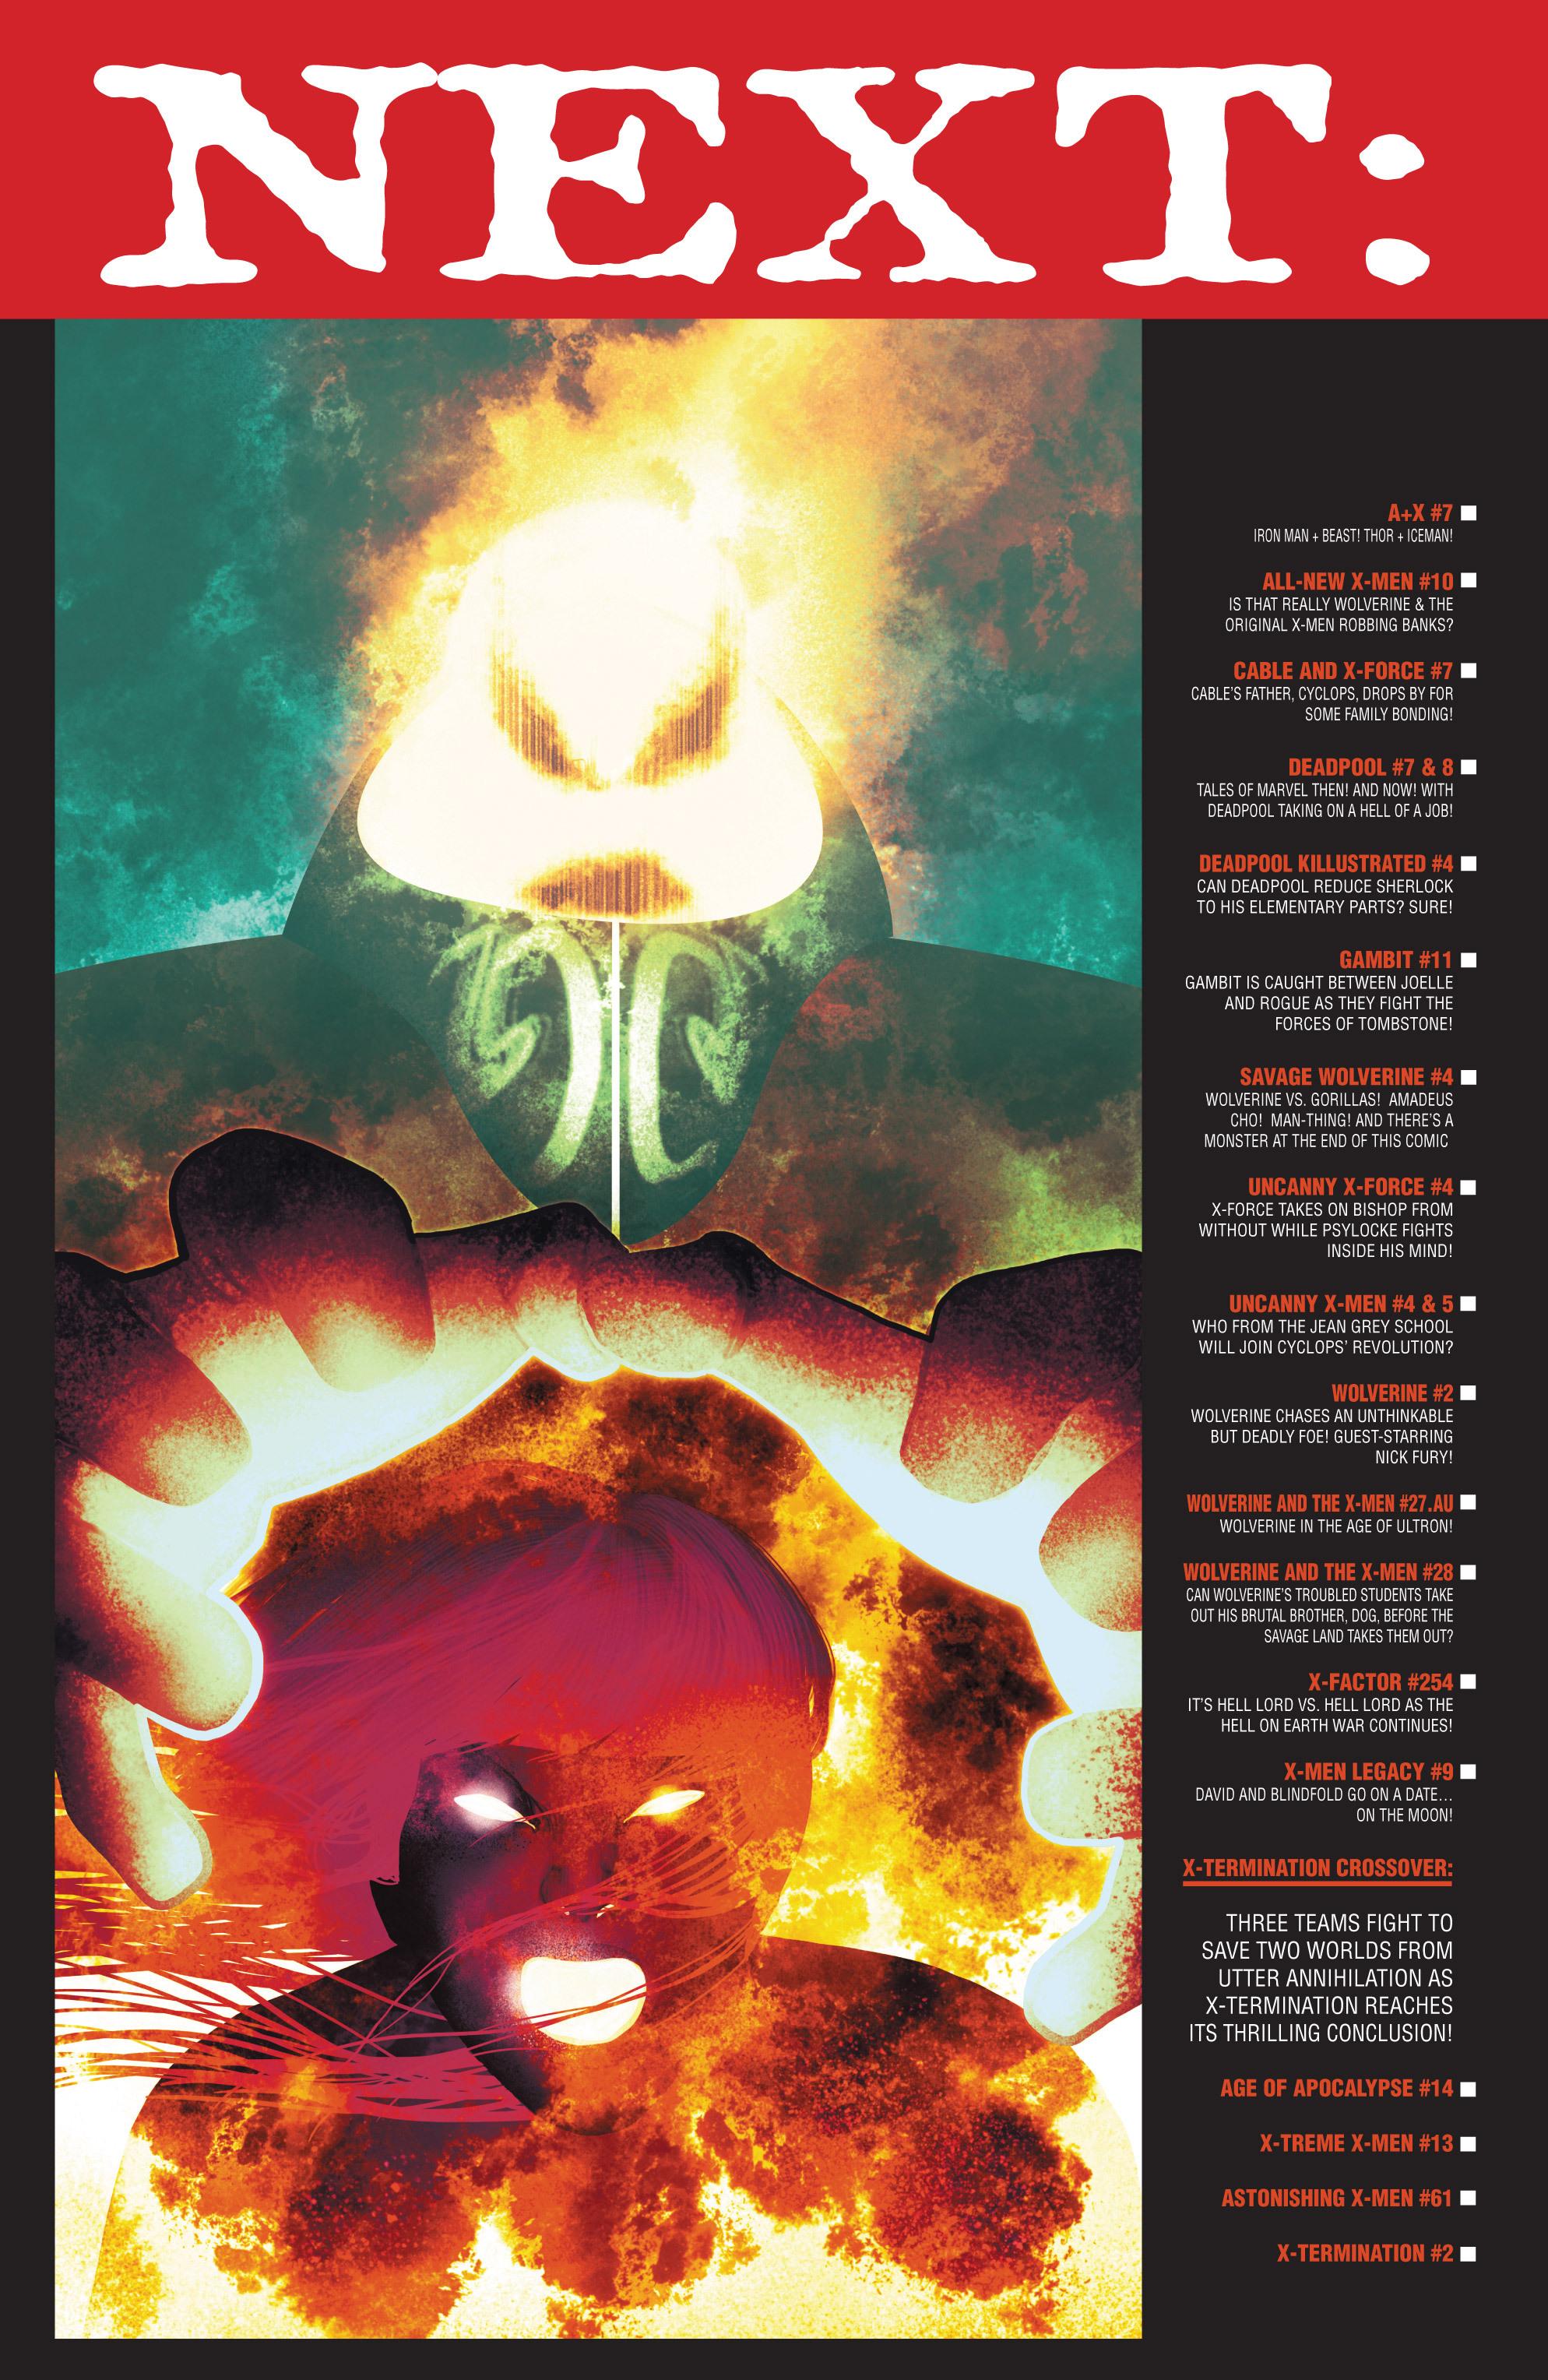 Read online Uncanny X-Men (2013) comic -  Issue # _TPB 1 - Revolution - 105